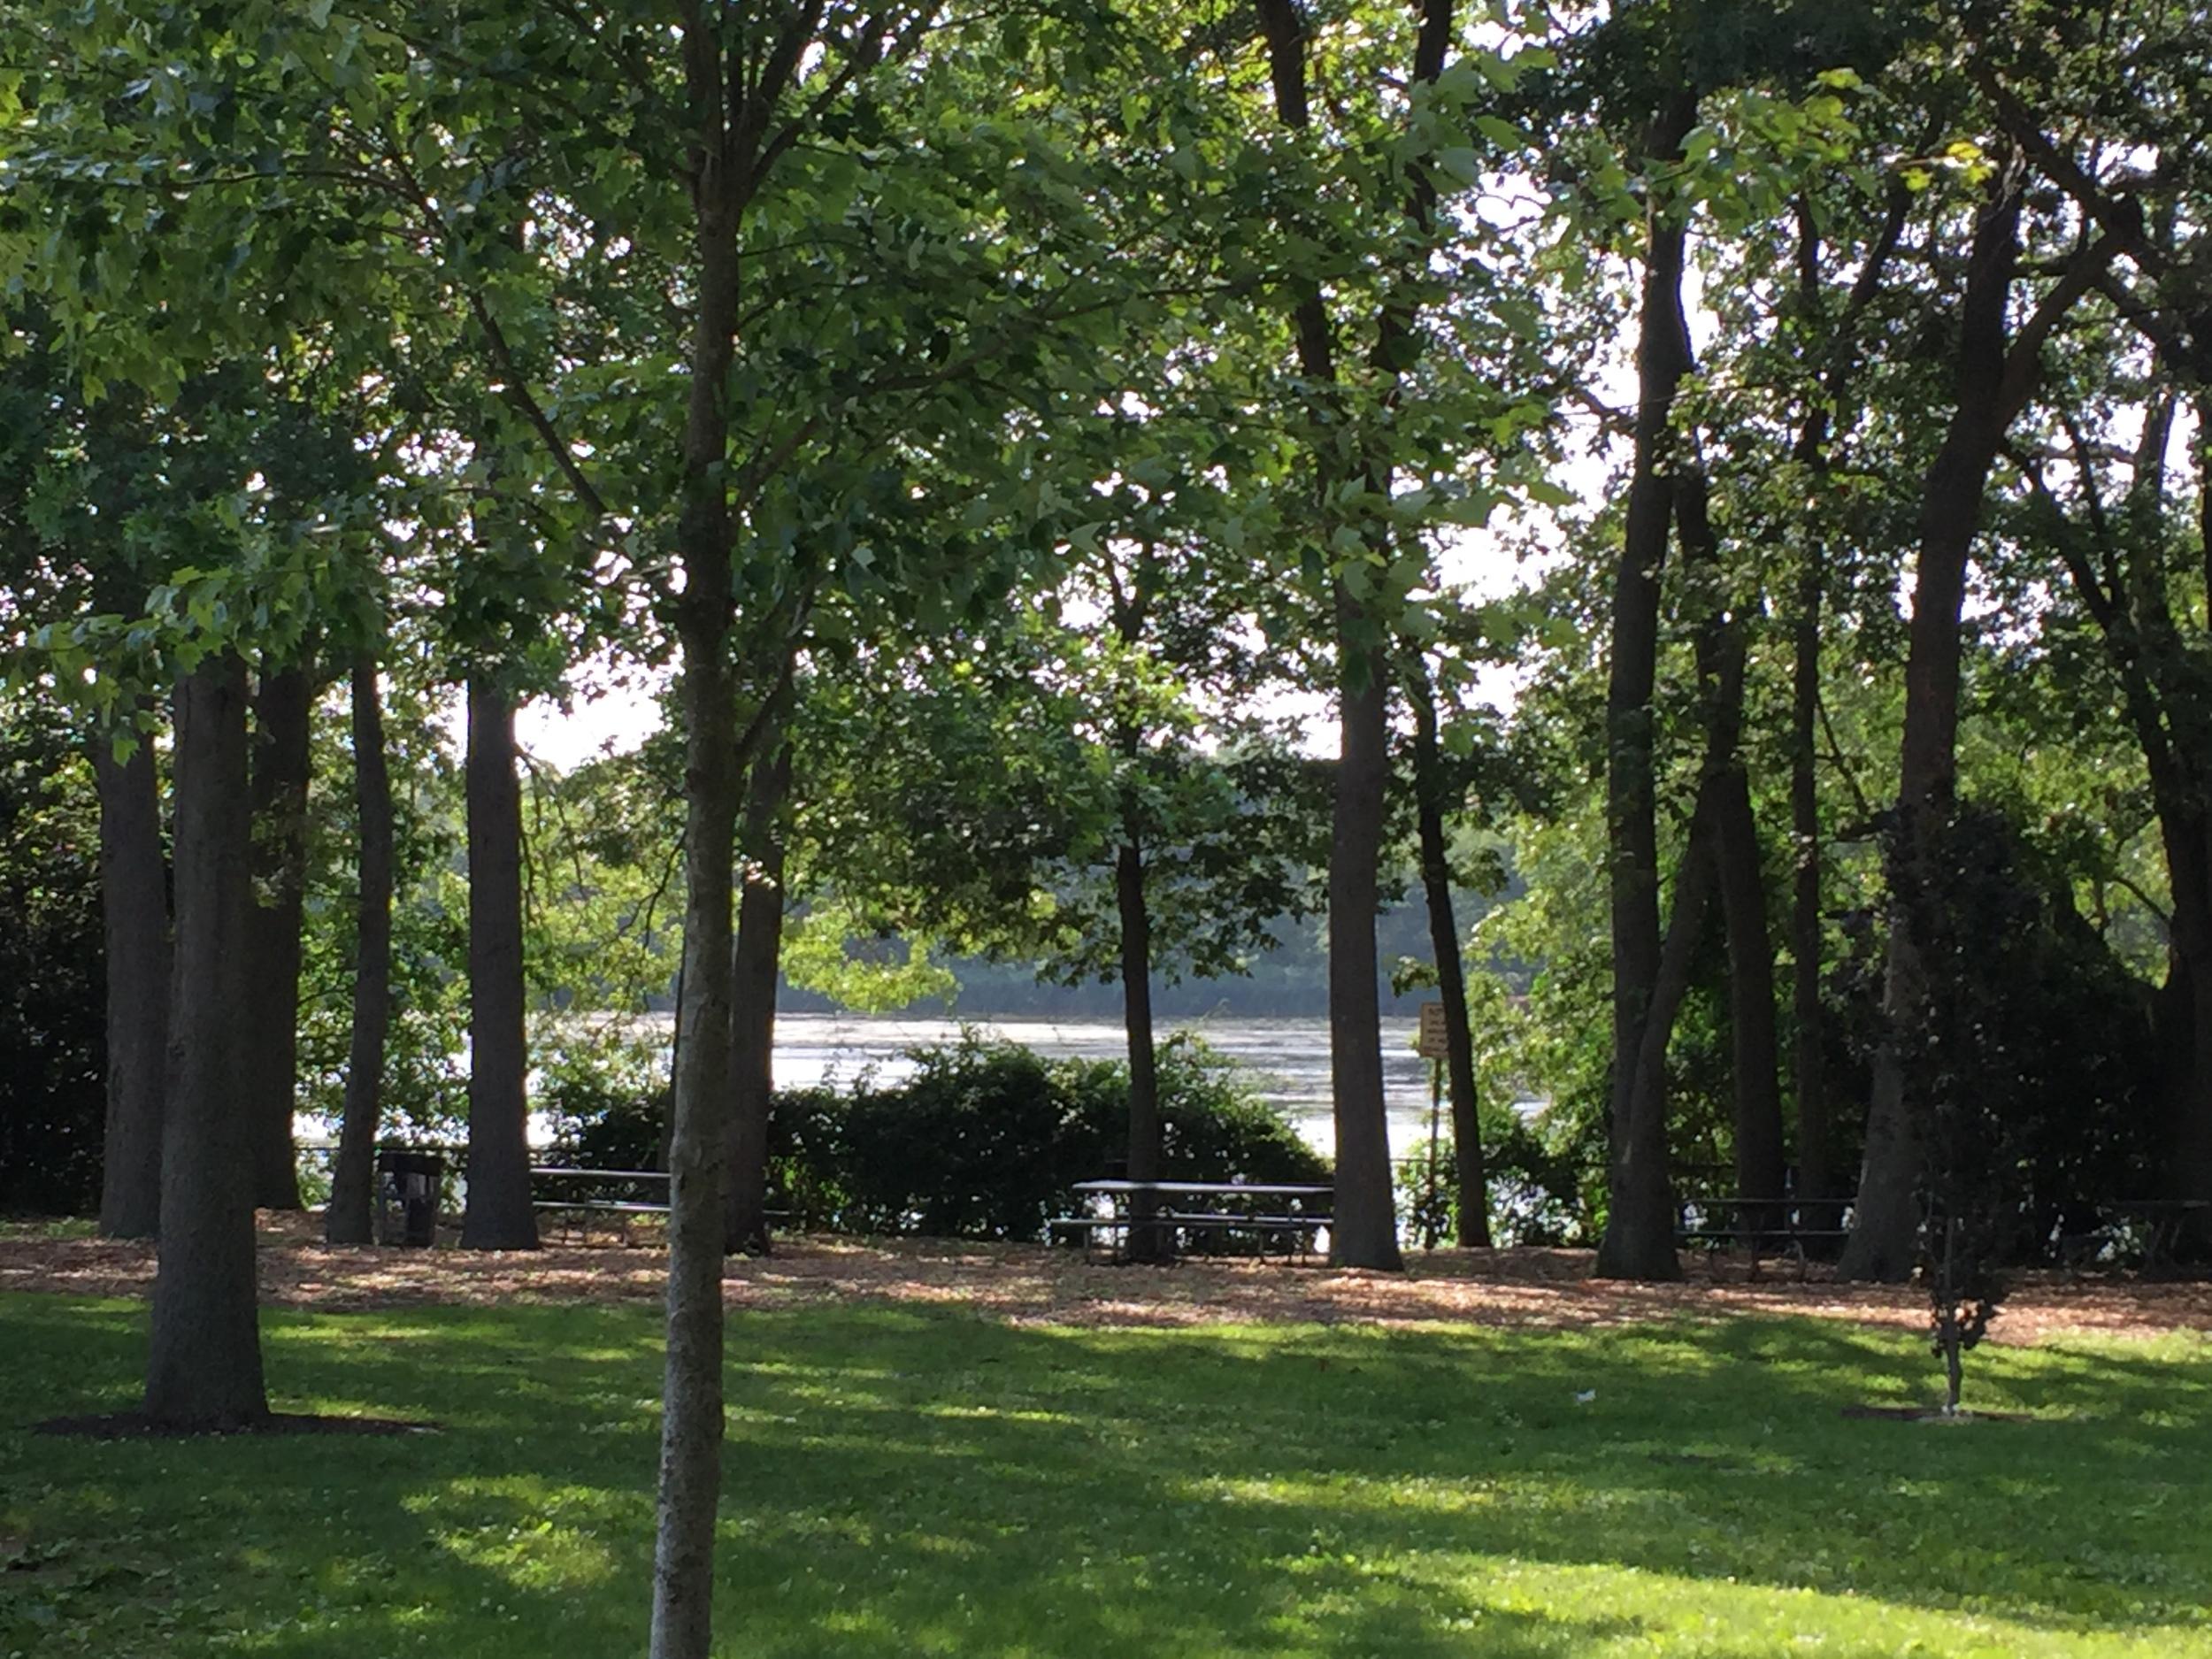 Playground view at Brady Park